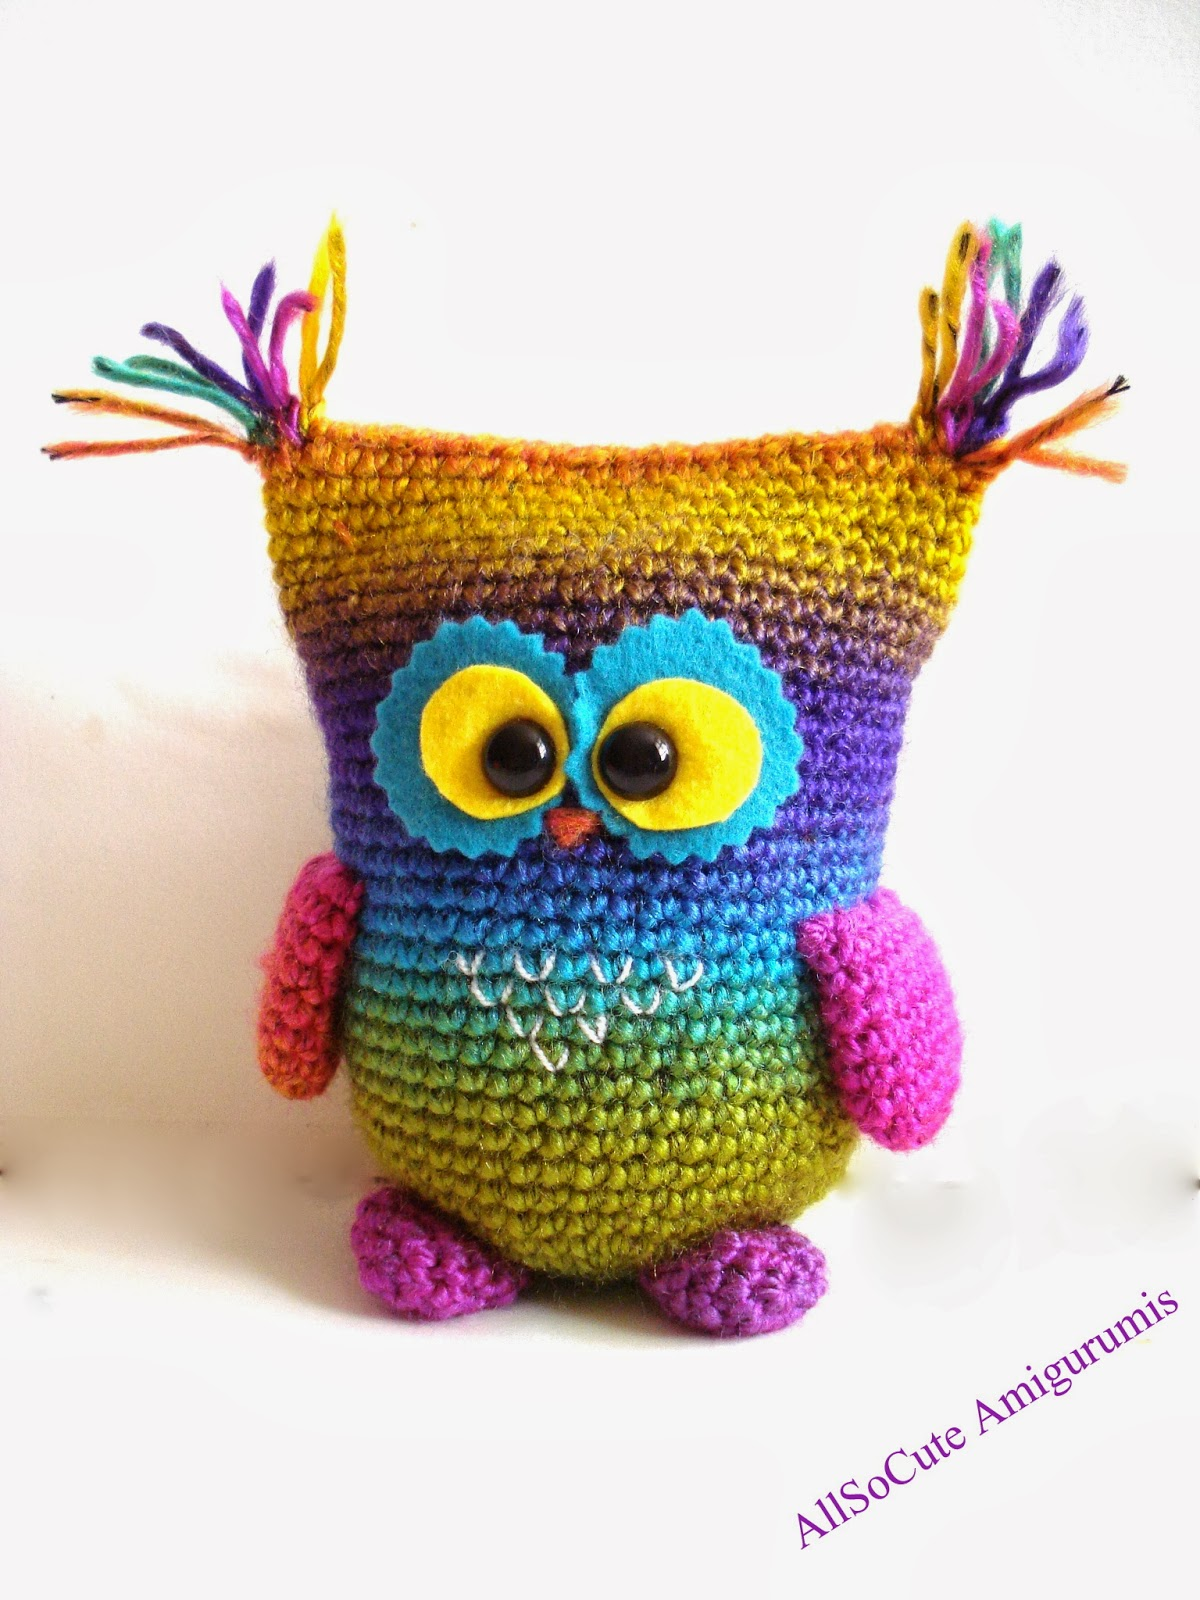 AllSoCute Amigurumis: Amigurumi Owl, Crochet Owl